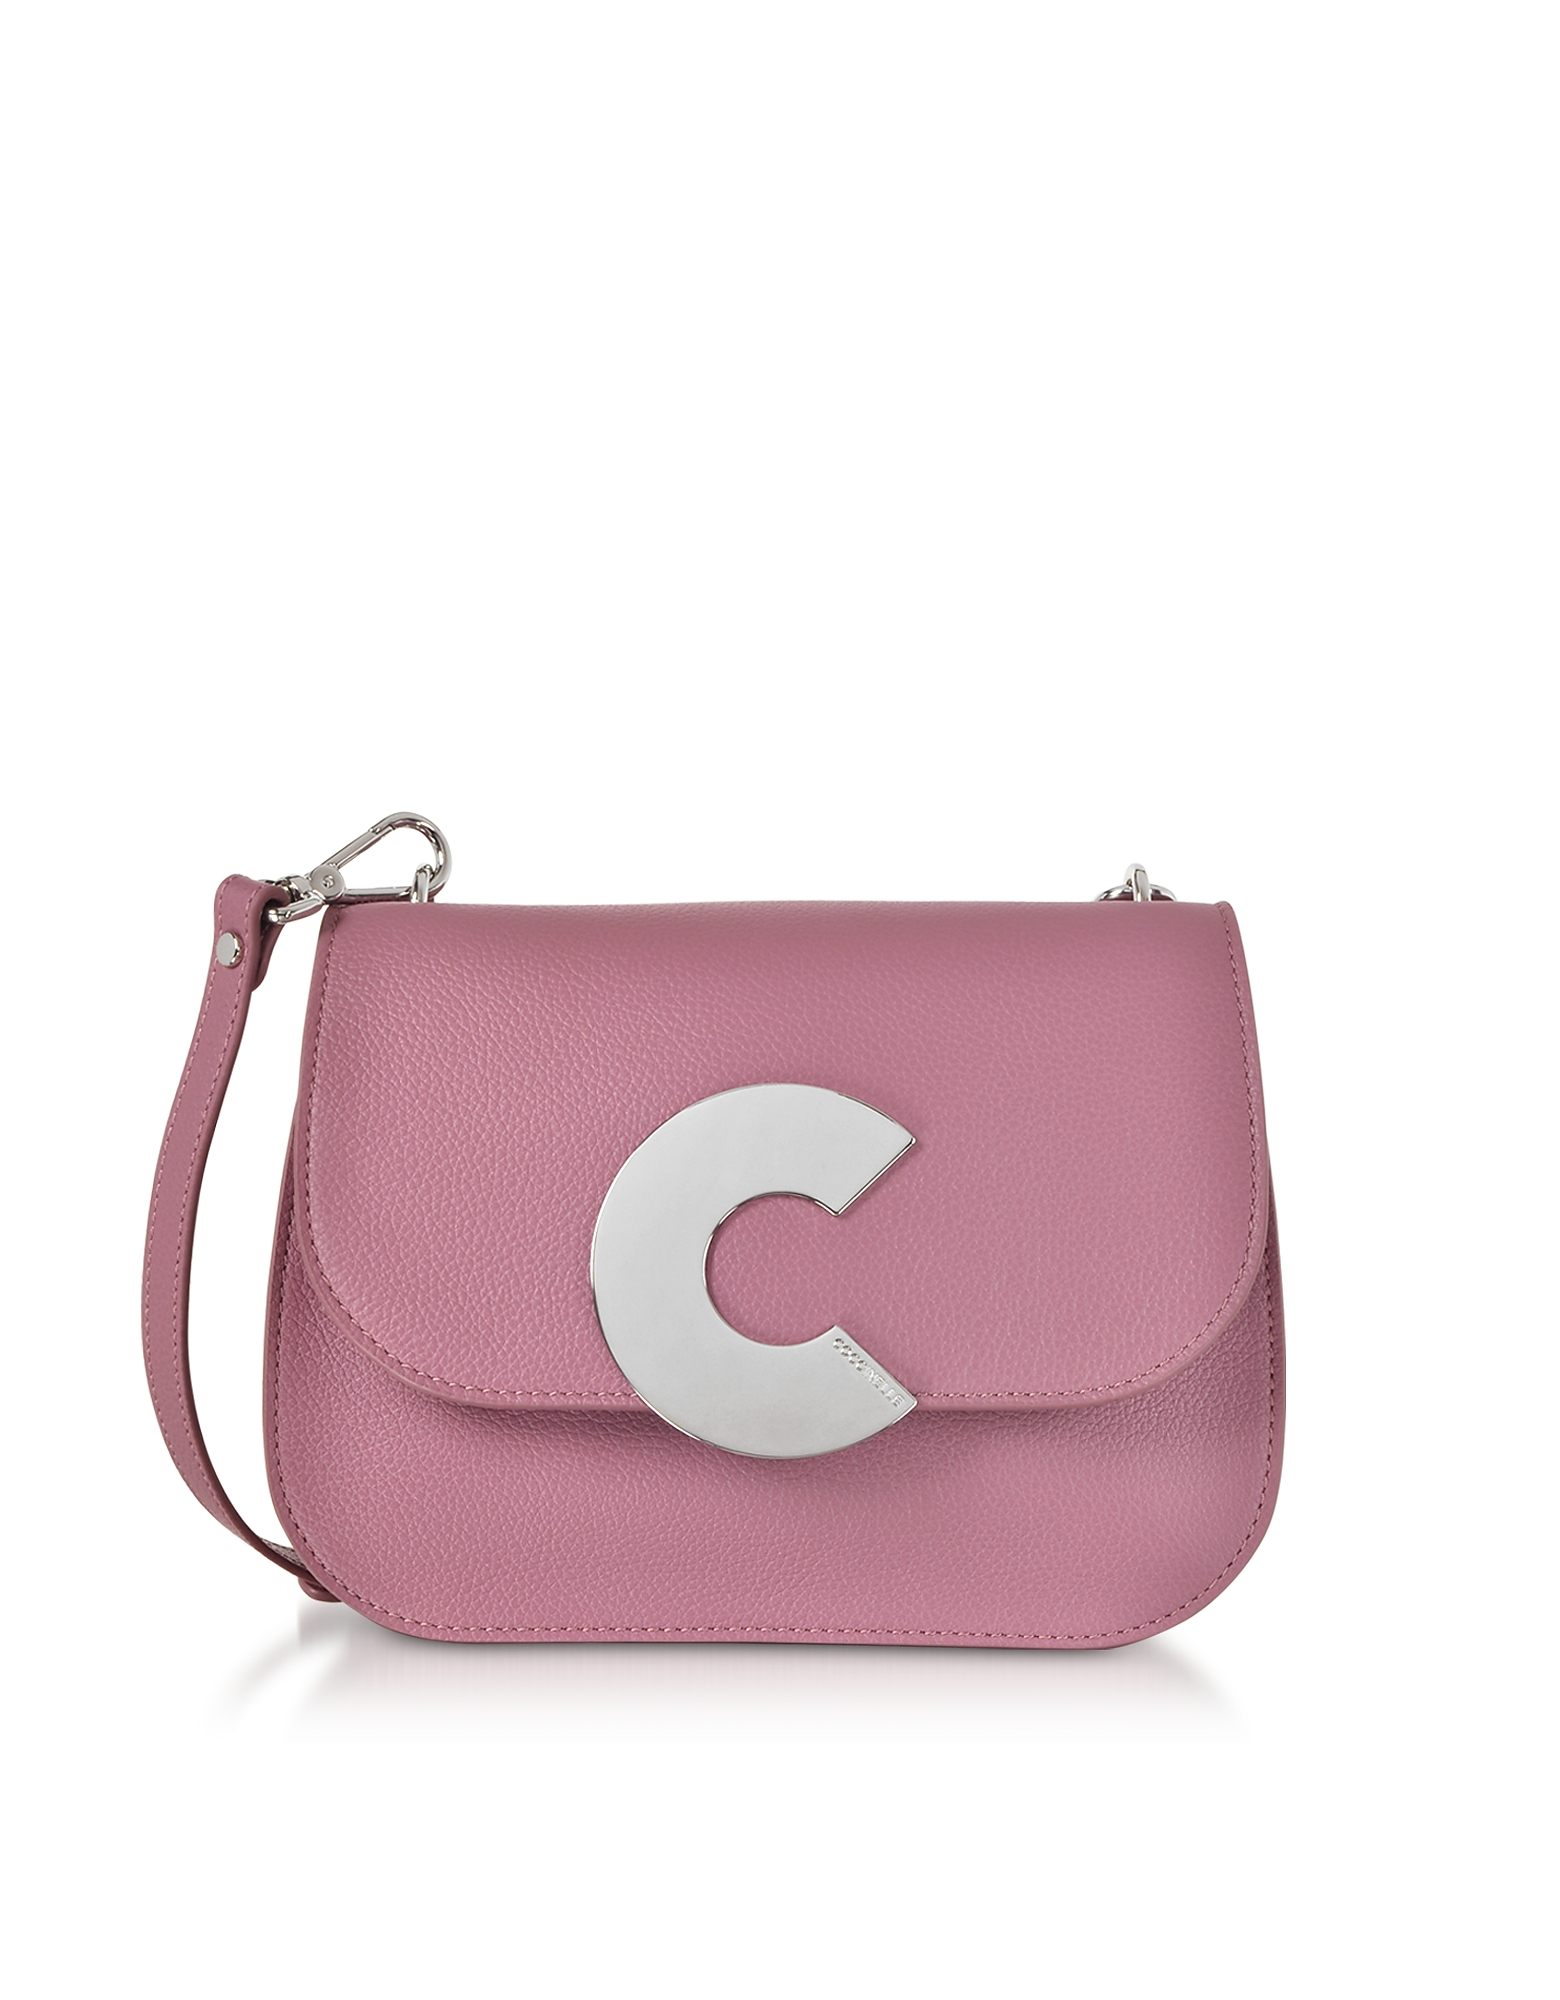 Coccinelle Designer Handbags 6ede770cd4742